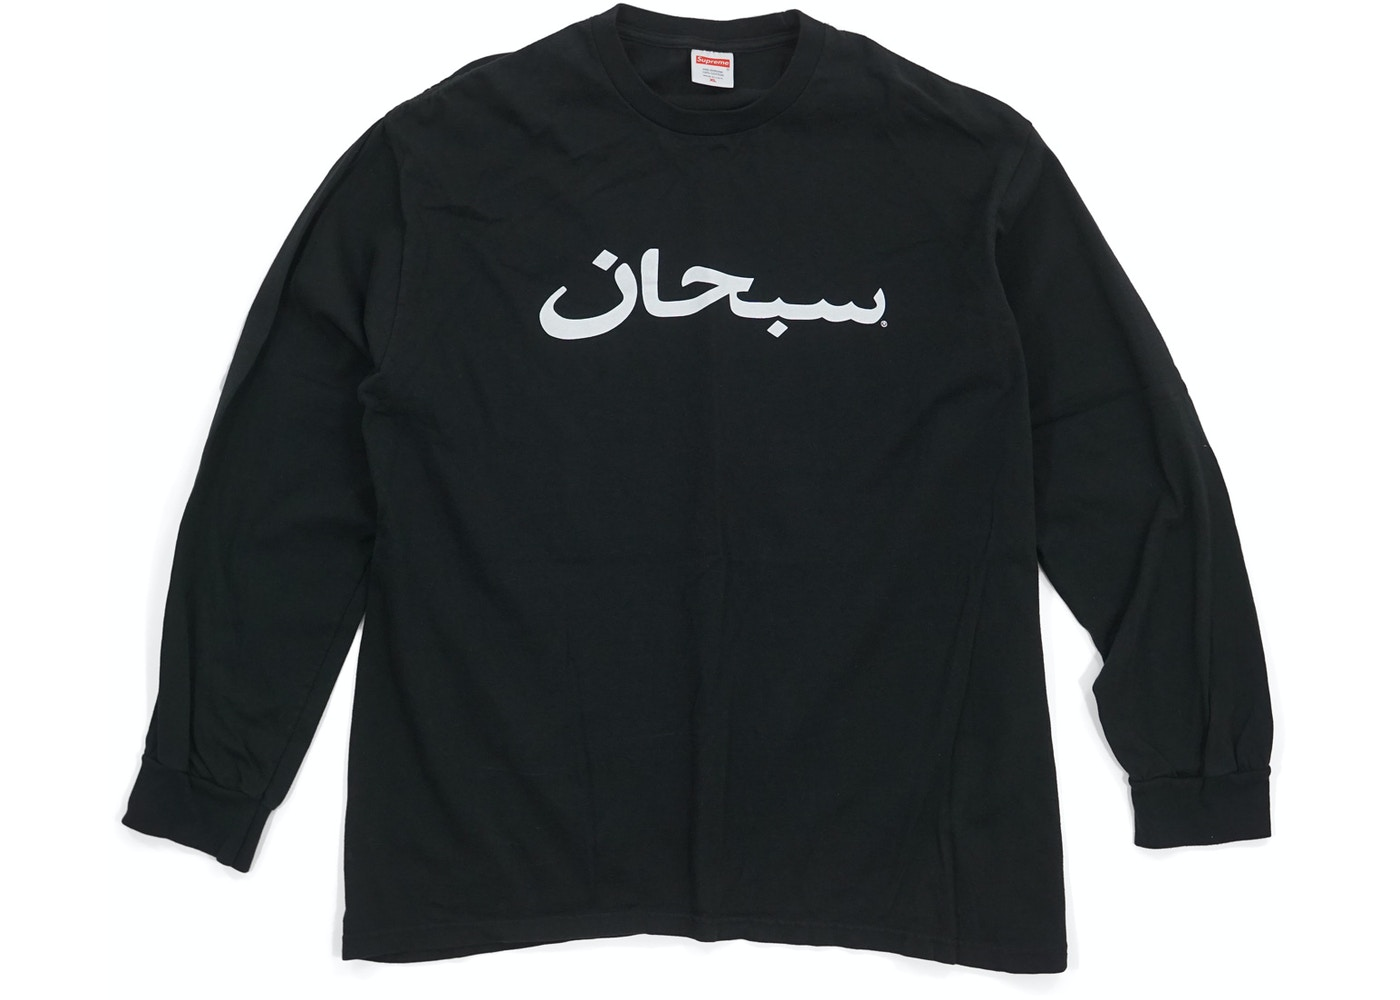 c0e970b4856a Supreme Arabic Logo L/S Tee Black - FW17